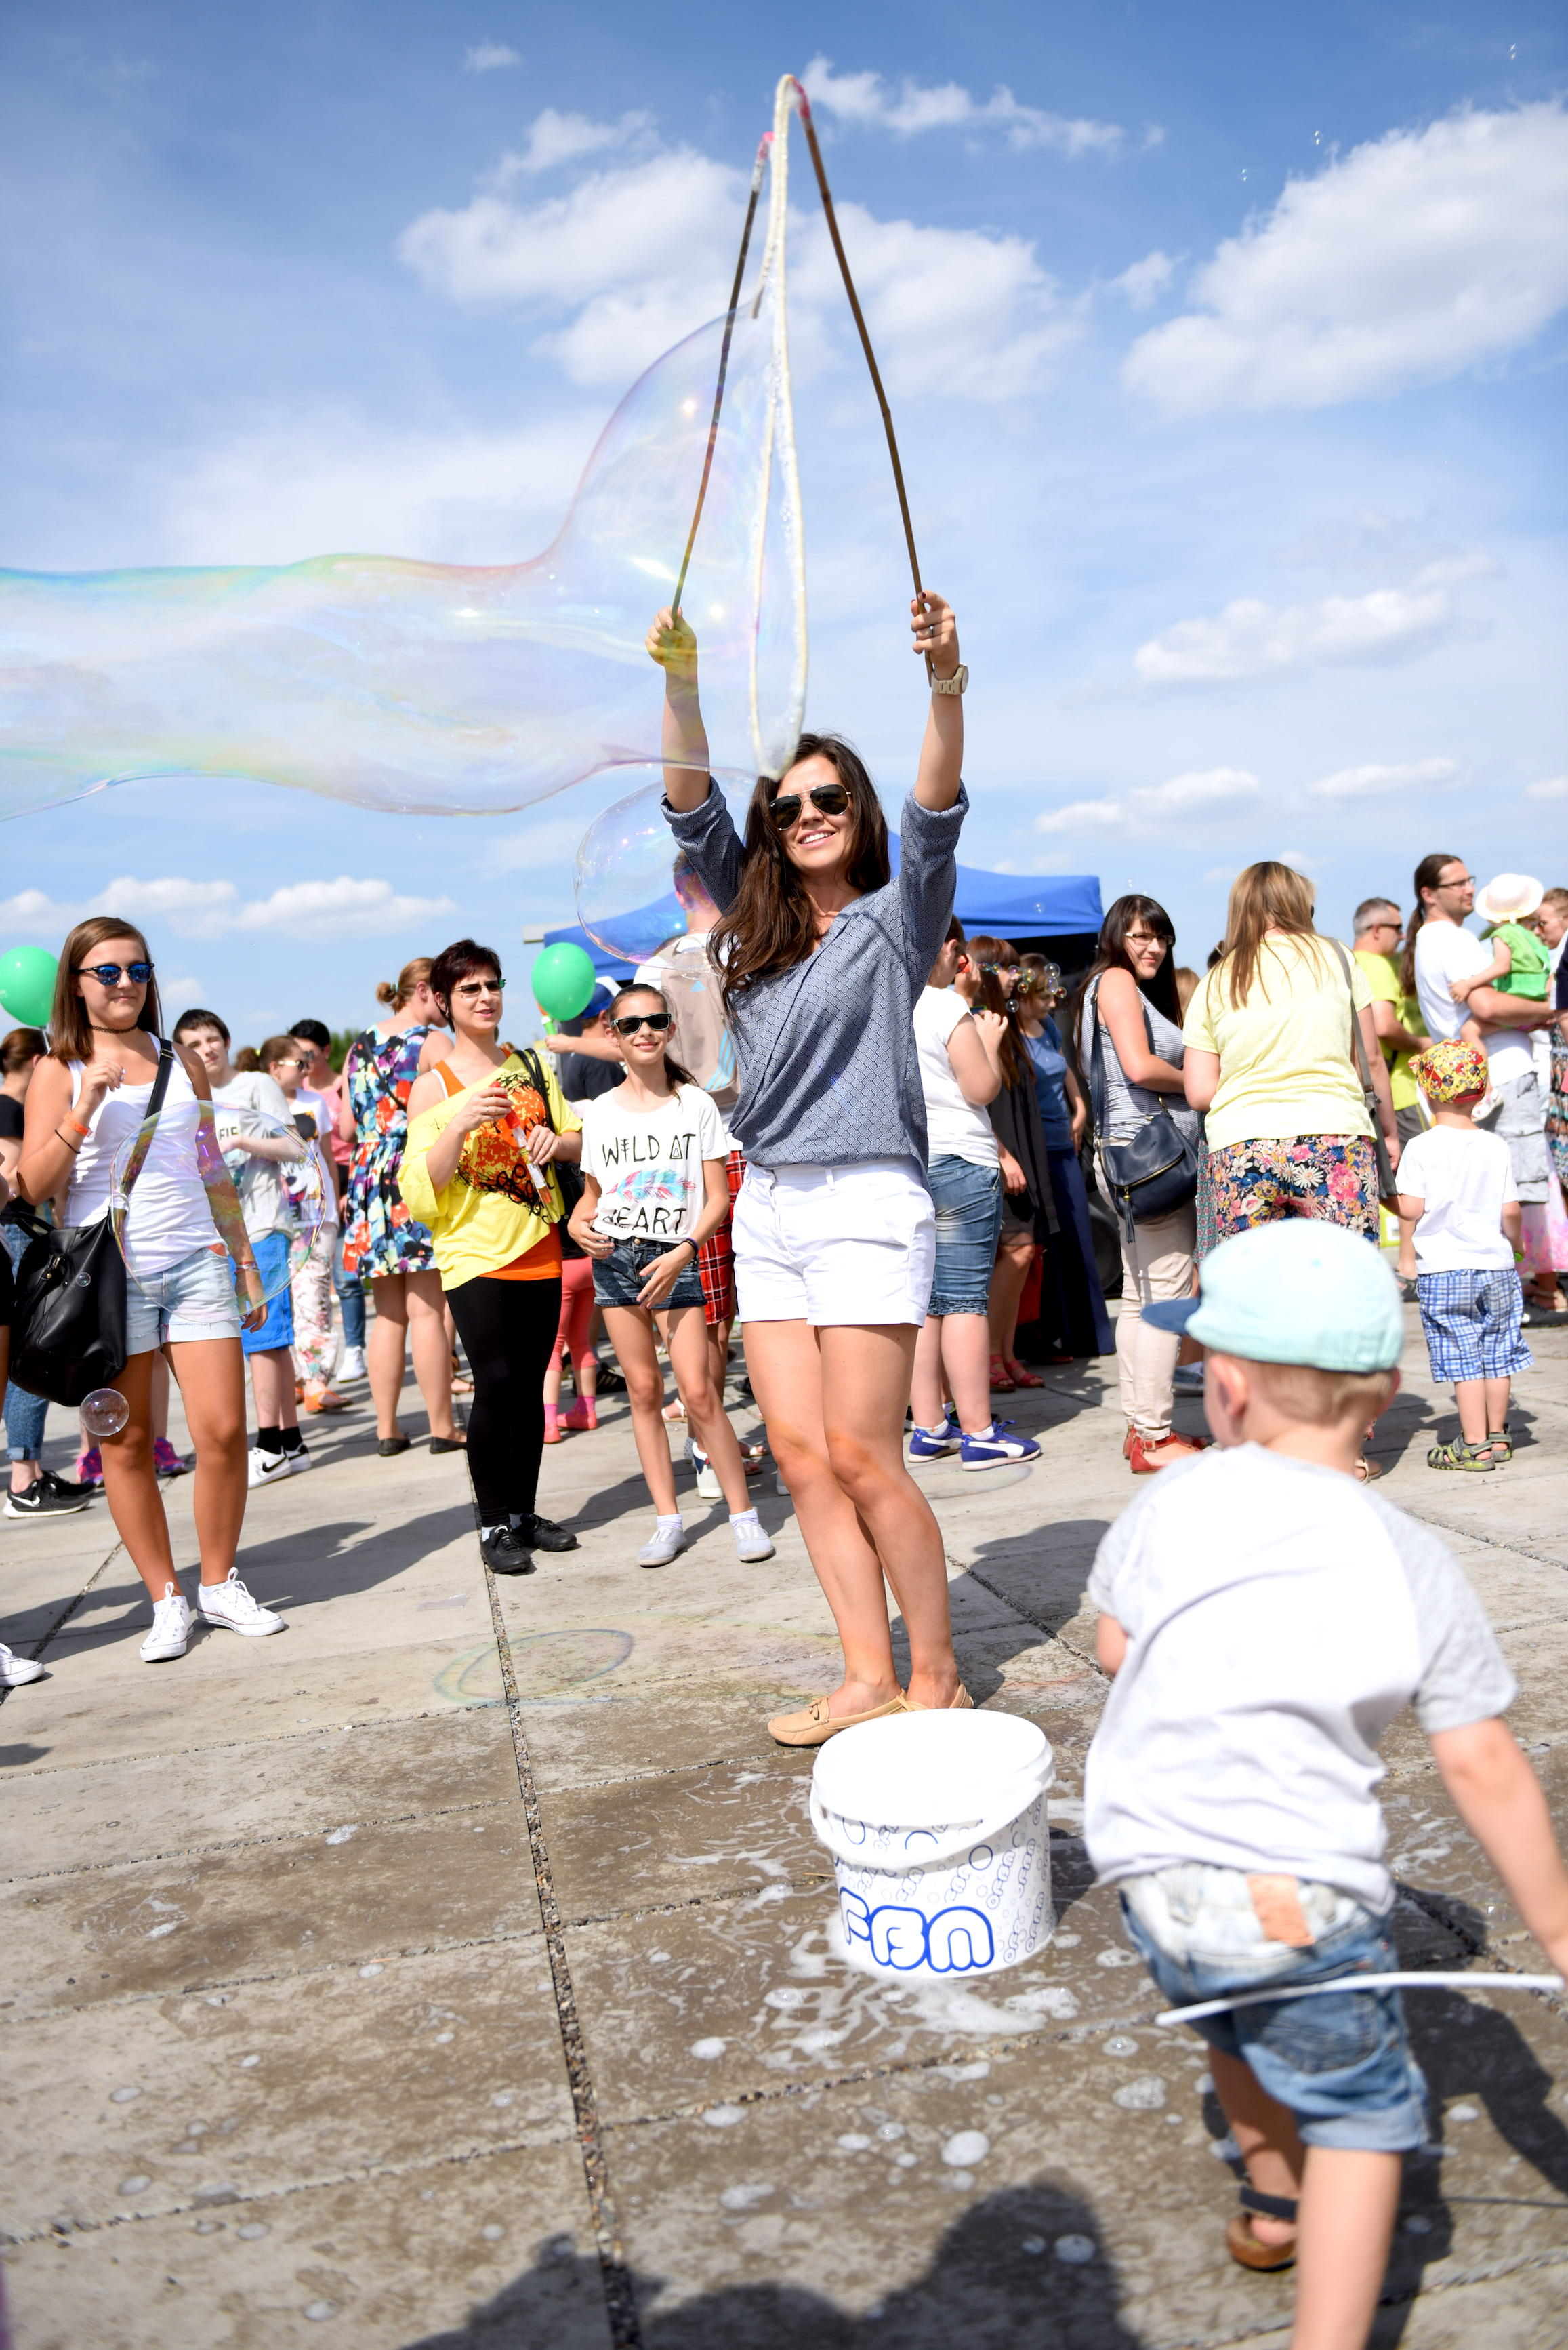 festiwal baniek mydlanych w lublinie